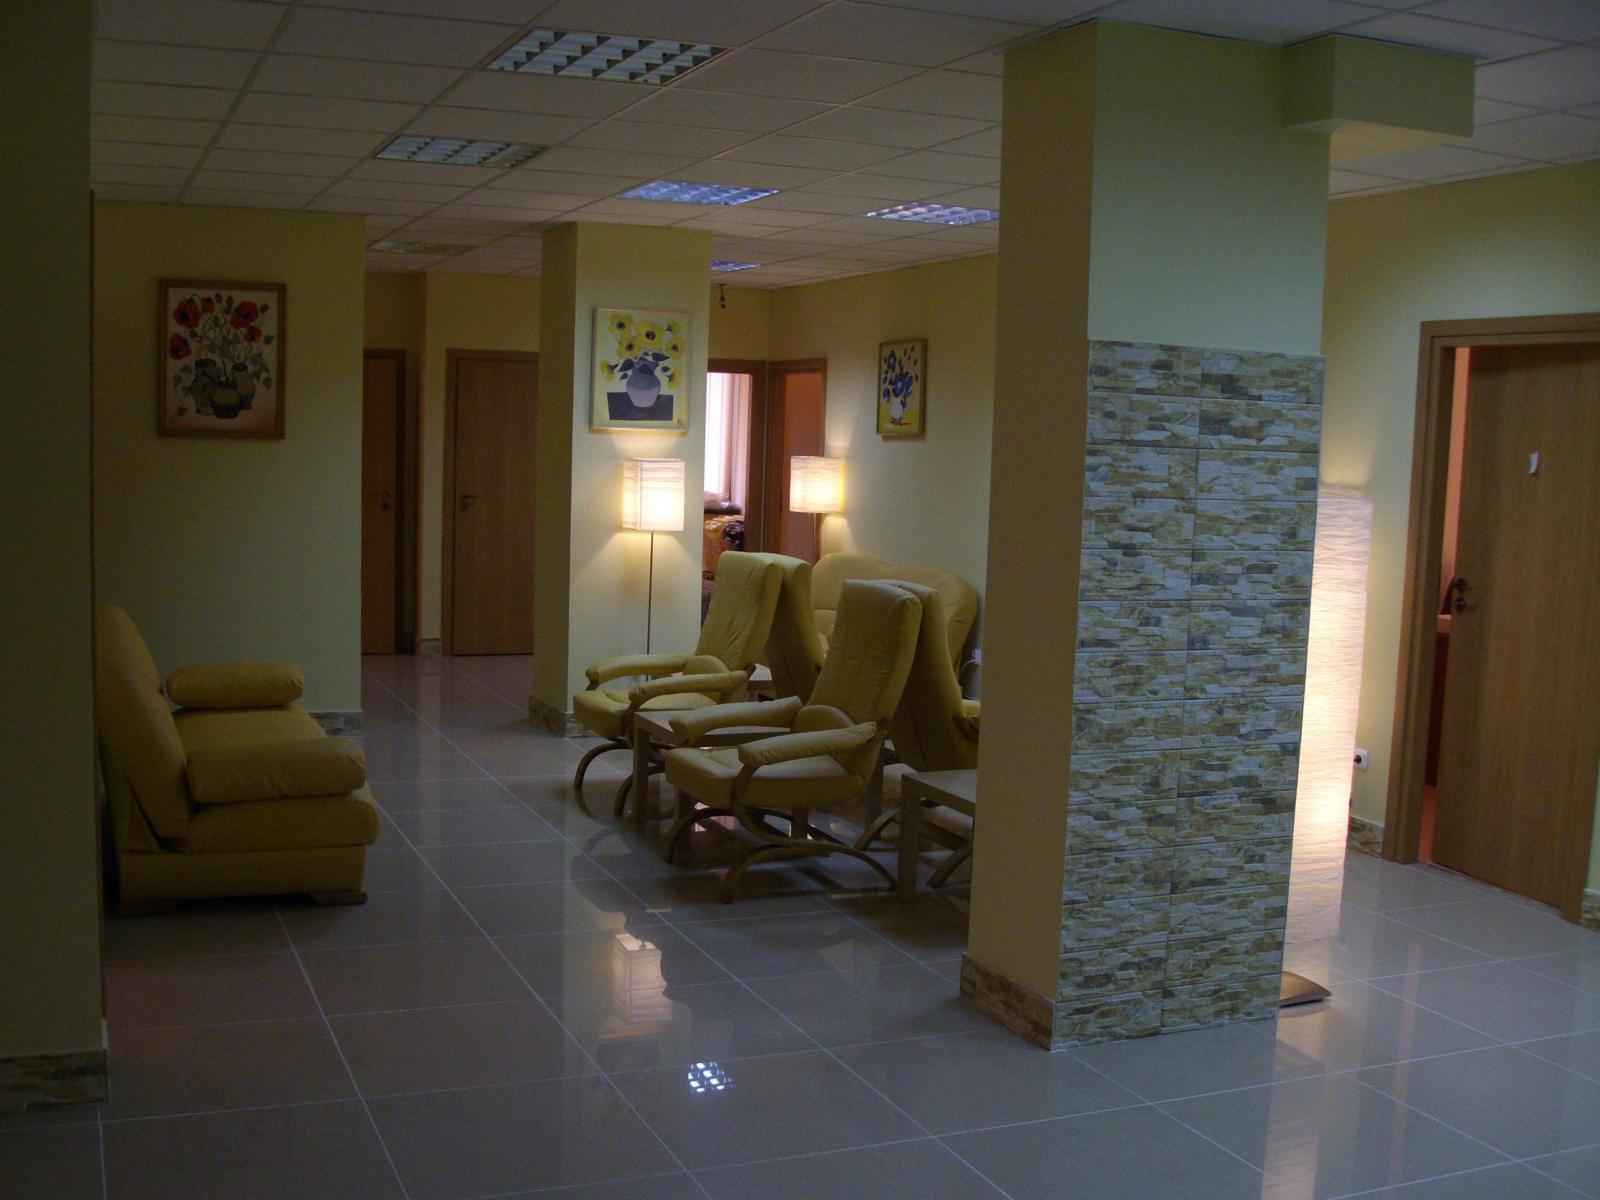 Alpha Medical Center - IMGP0228.JPG